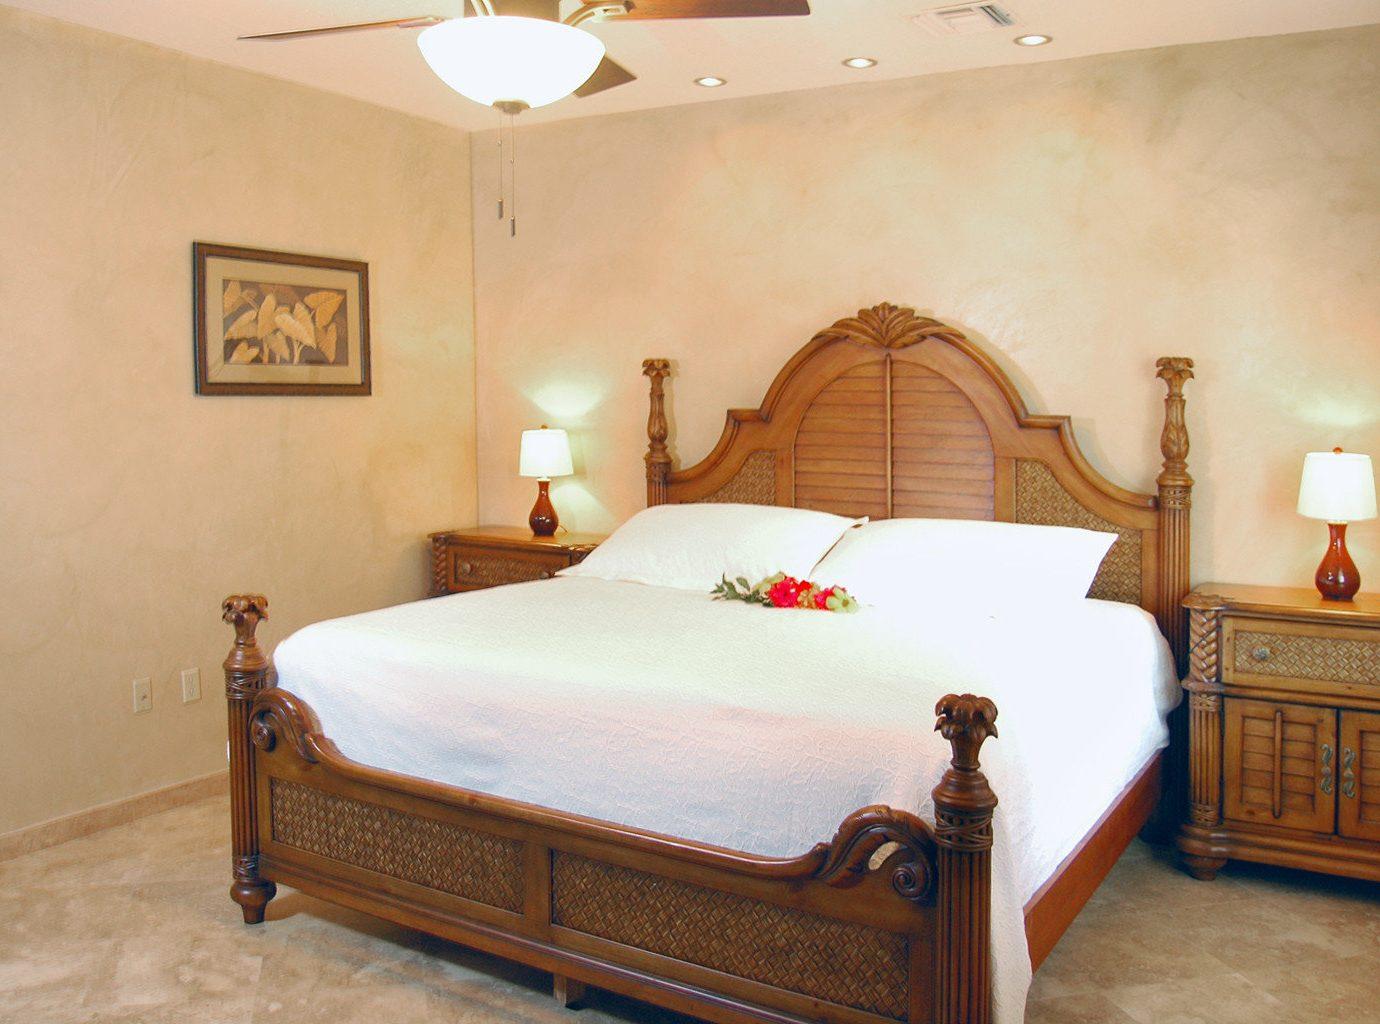 Balcony Bedroom Classic Eco Island Jungle Outdoor Activities property cottage hardwood bed frame Suite tan